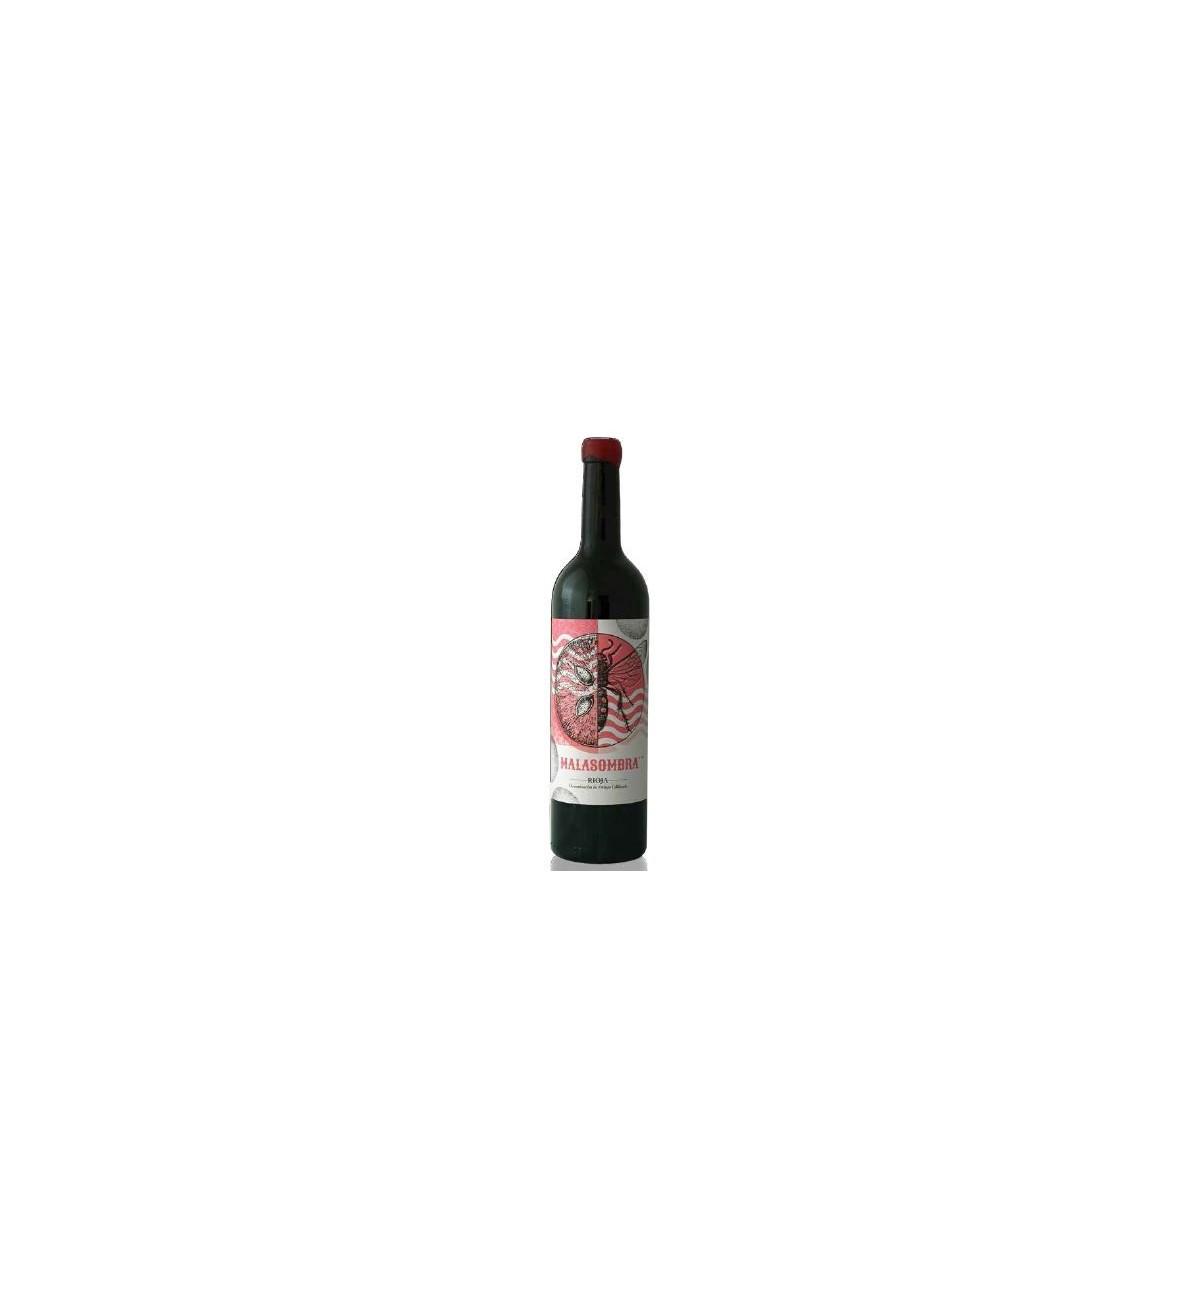 Malasombra 2017 - LMT wines - Garnatxa, viñas viejas, Rioja